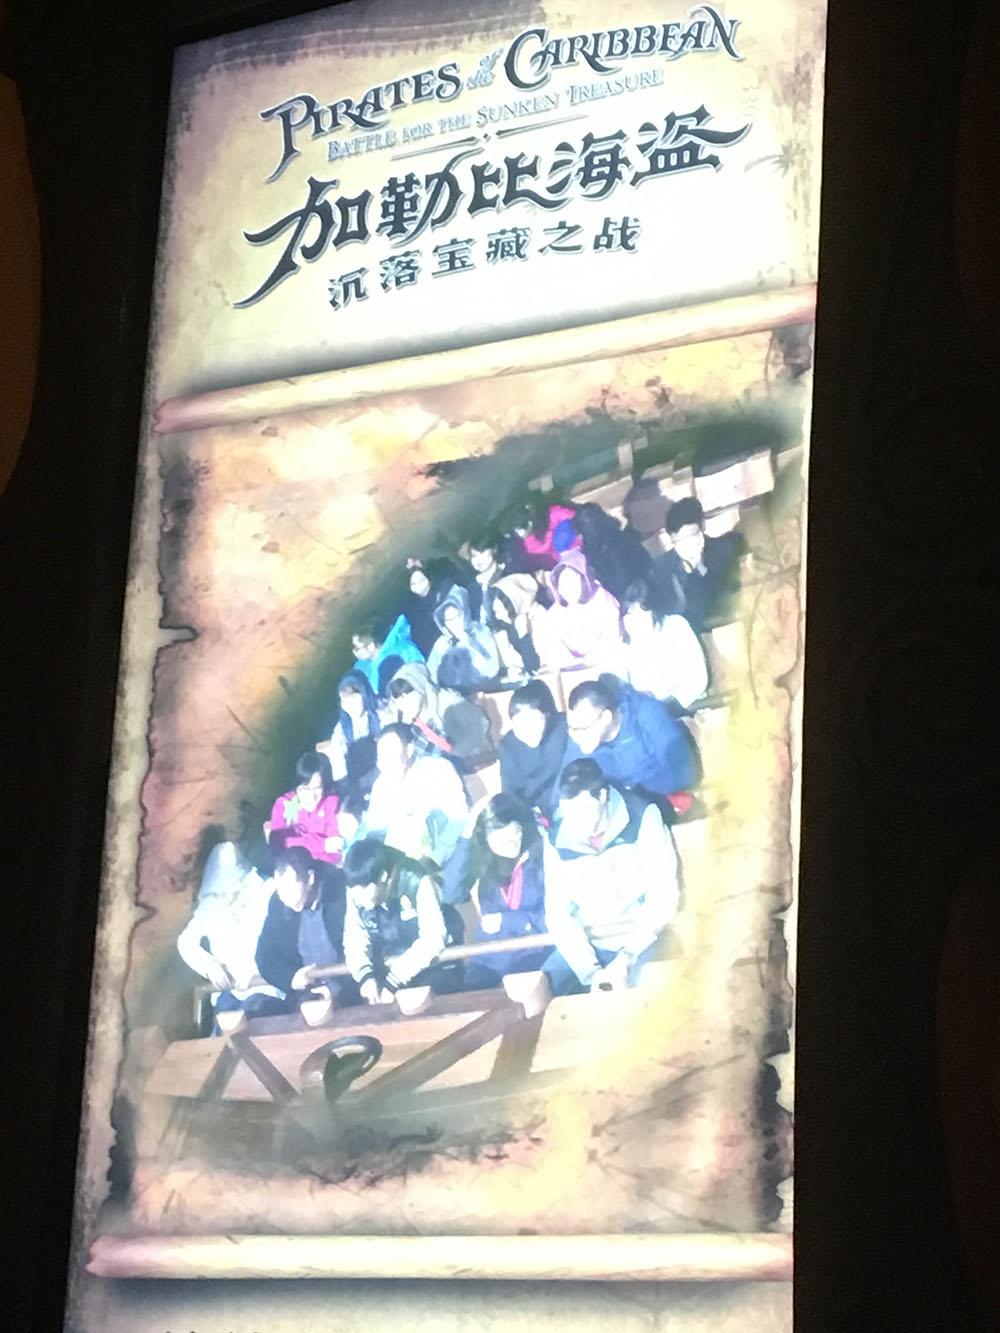 shanghaidisney_piratesofthecaribbean4